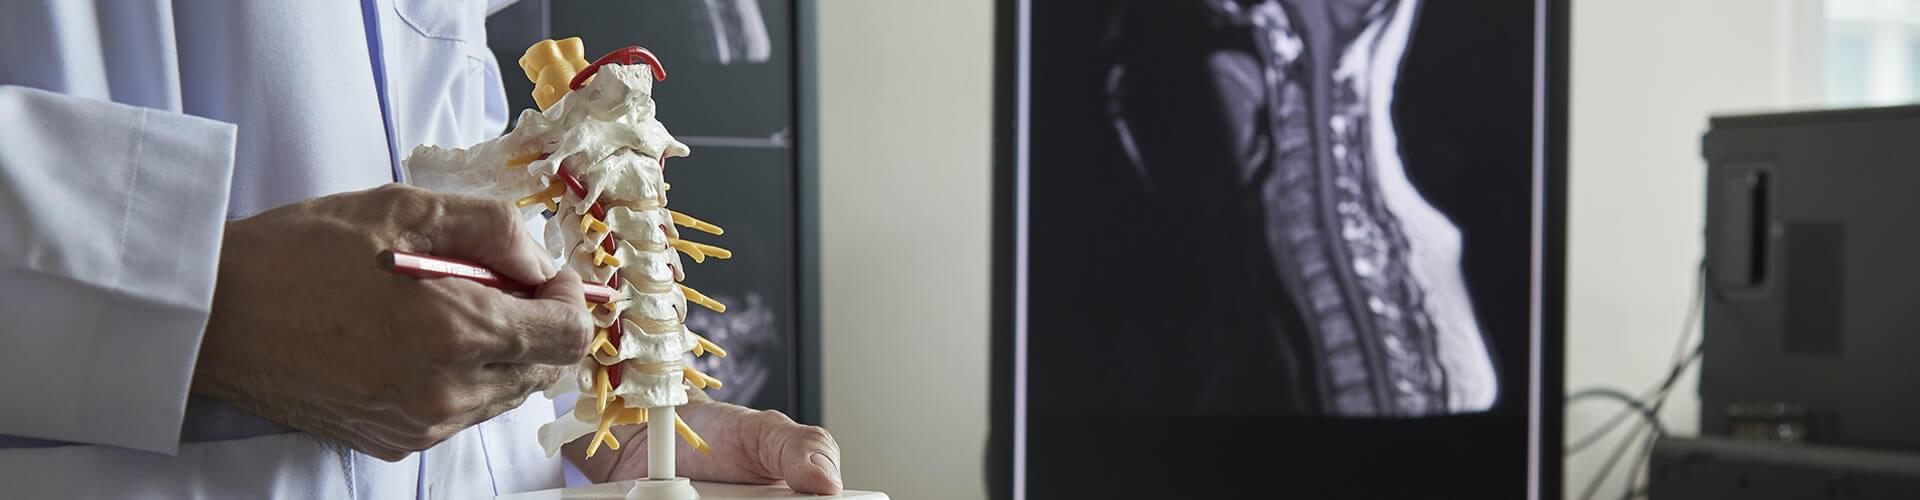 Aneurismas Cerebrais, Tumor de Hipofise